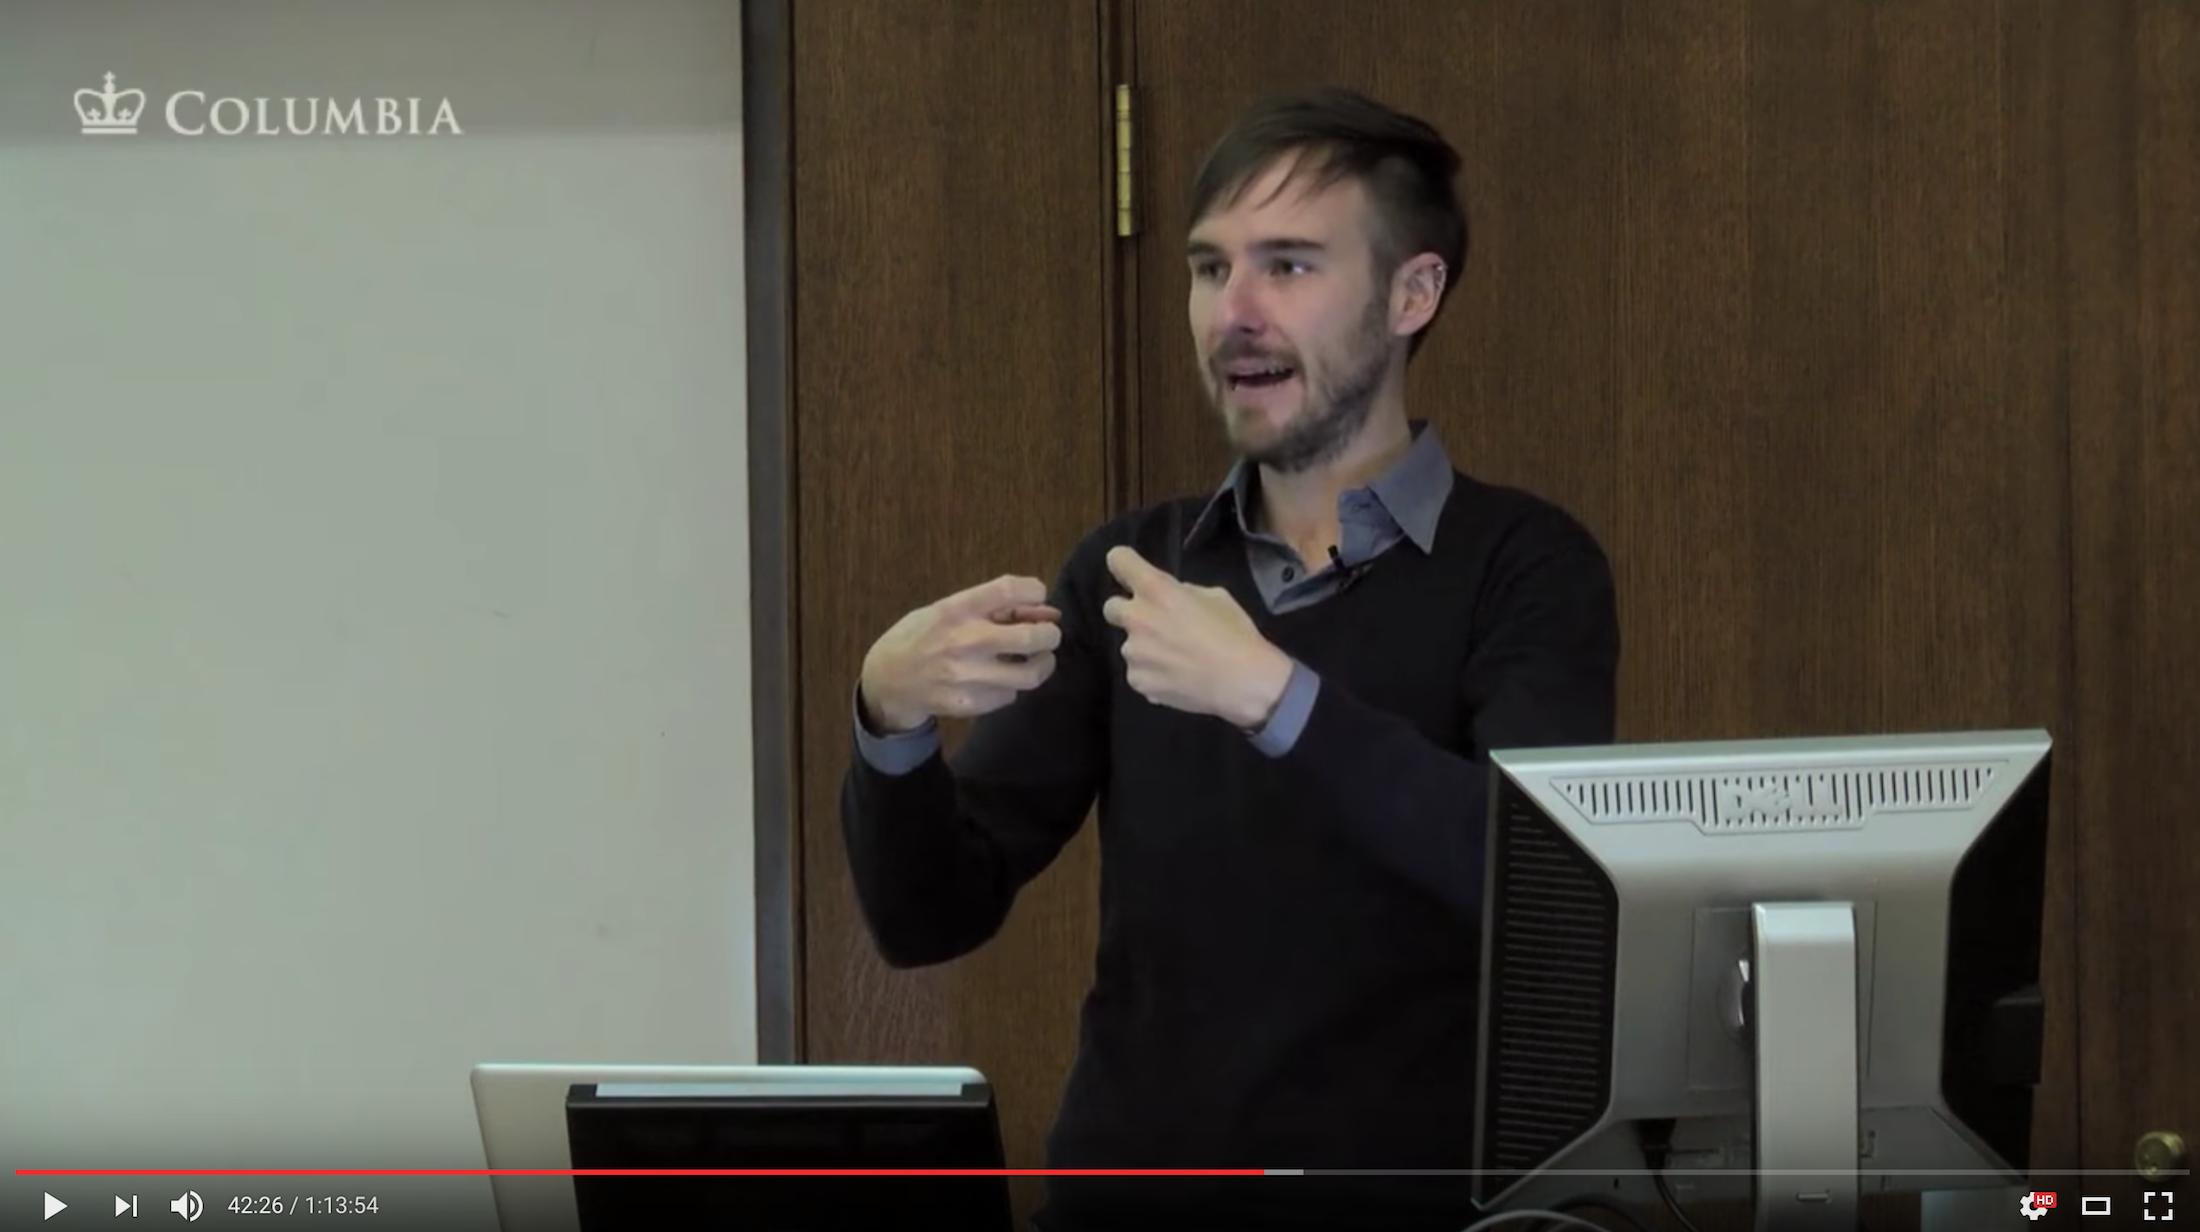 Screenshot of video of Chris Alen Sula